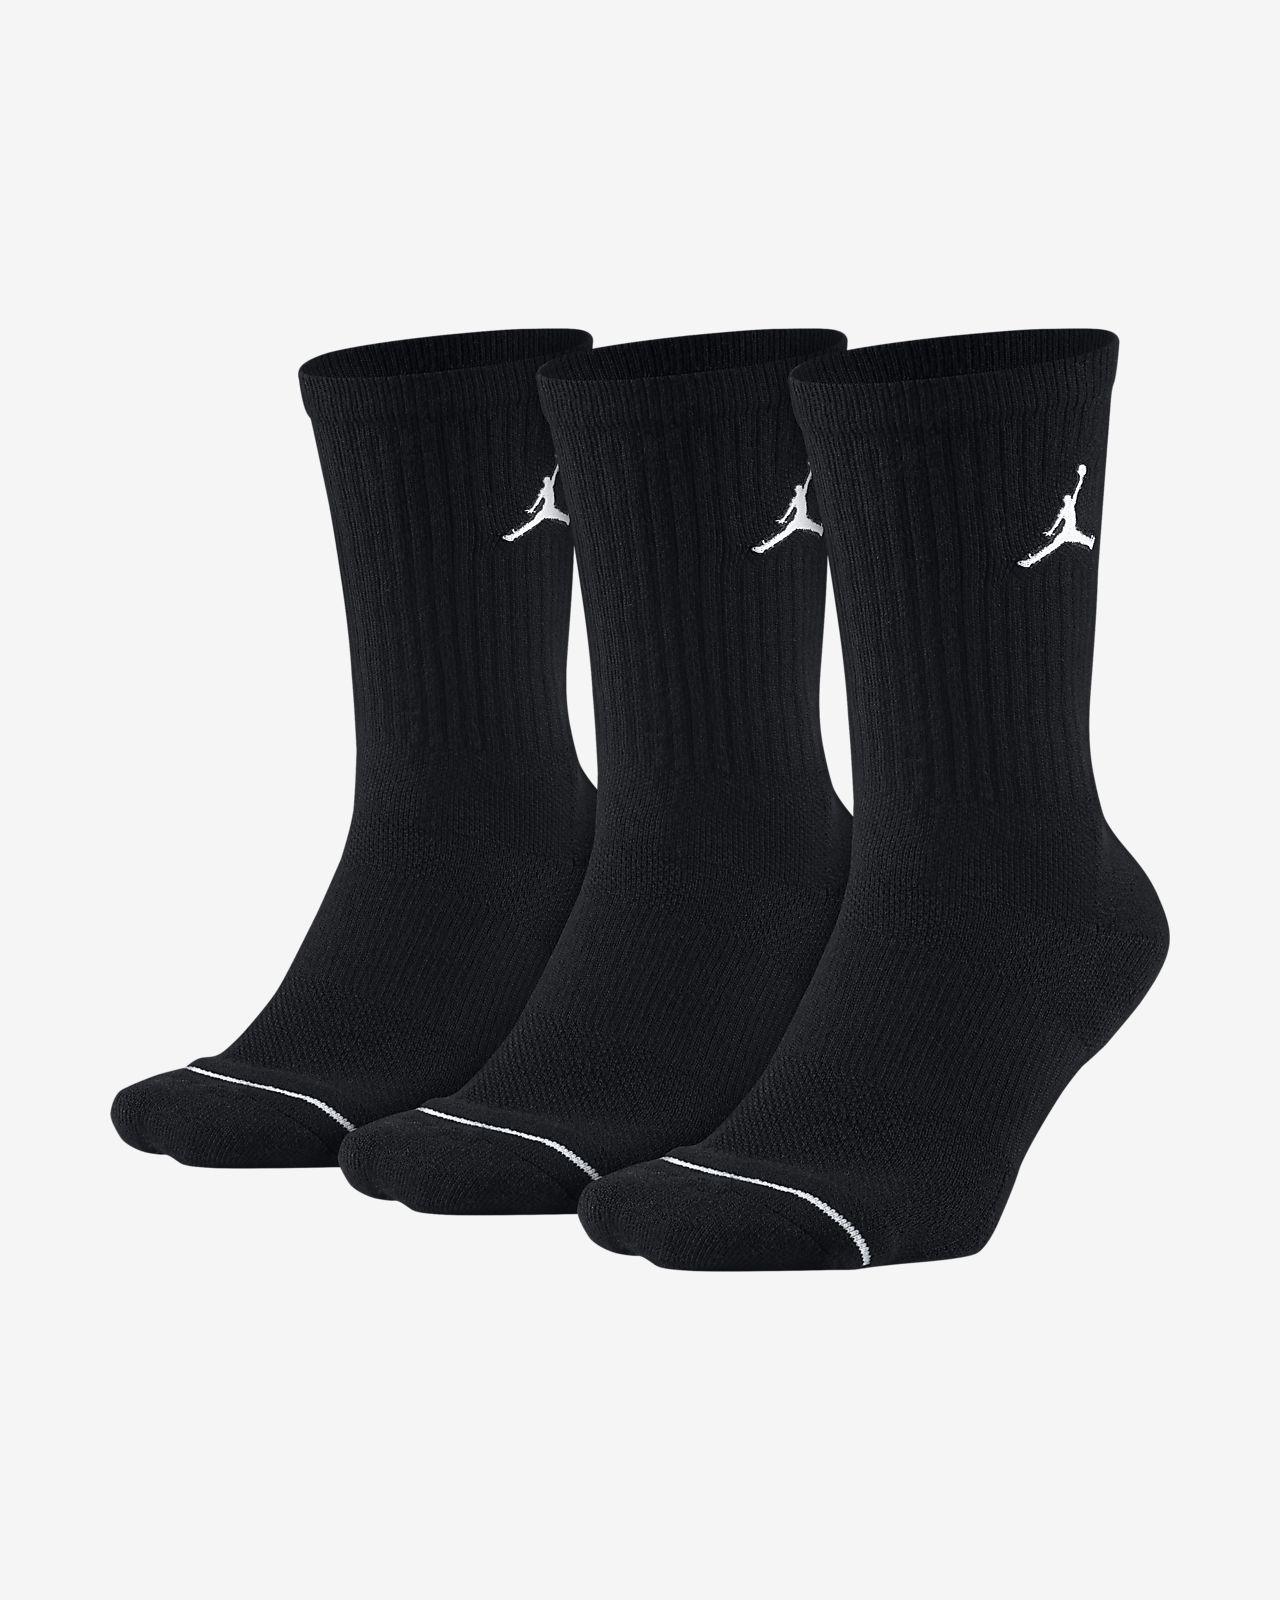 Dettagli su Donna Nike Fantasmine Calzini 3 Paia Donna Ragazza Caviglia Sport Misure UK 2 8